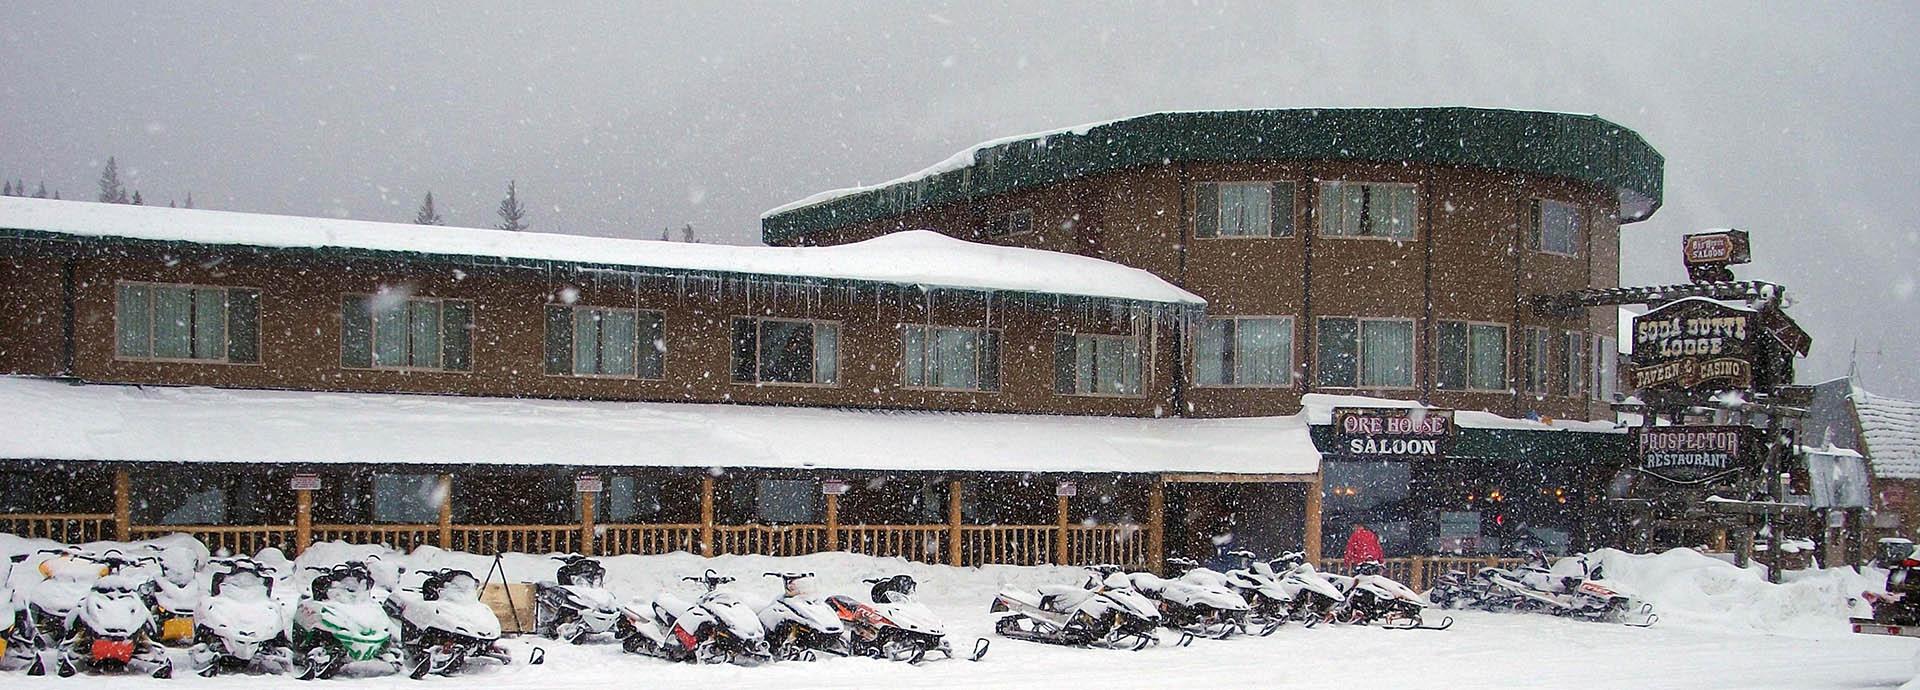 SnowyLodge